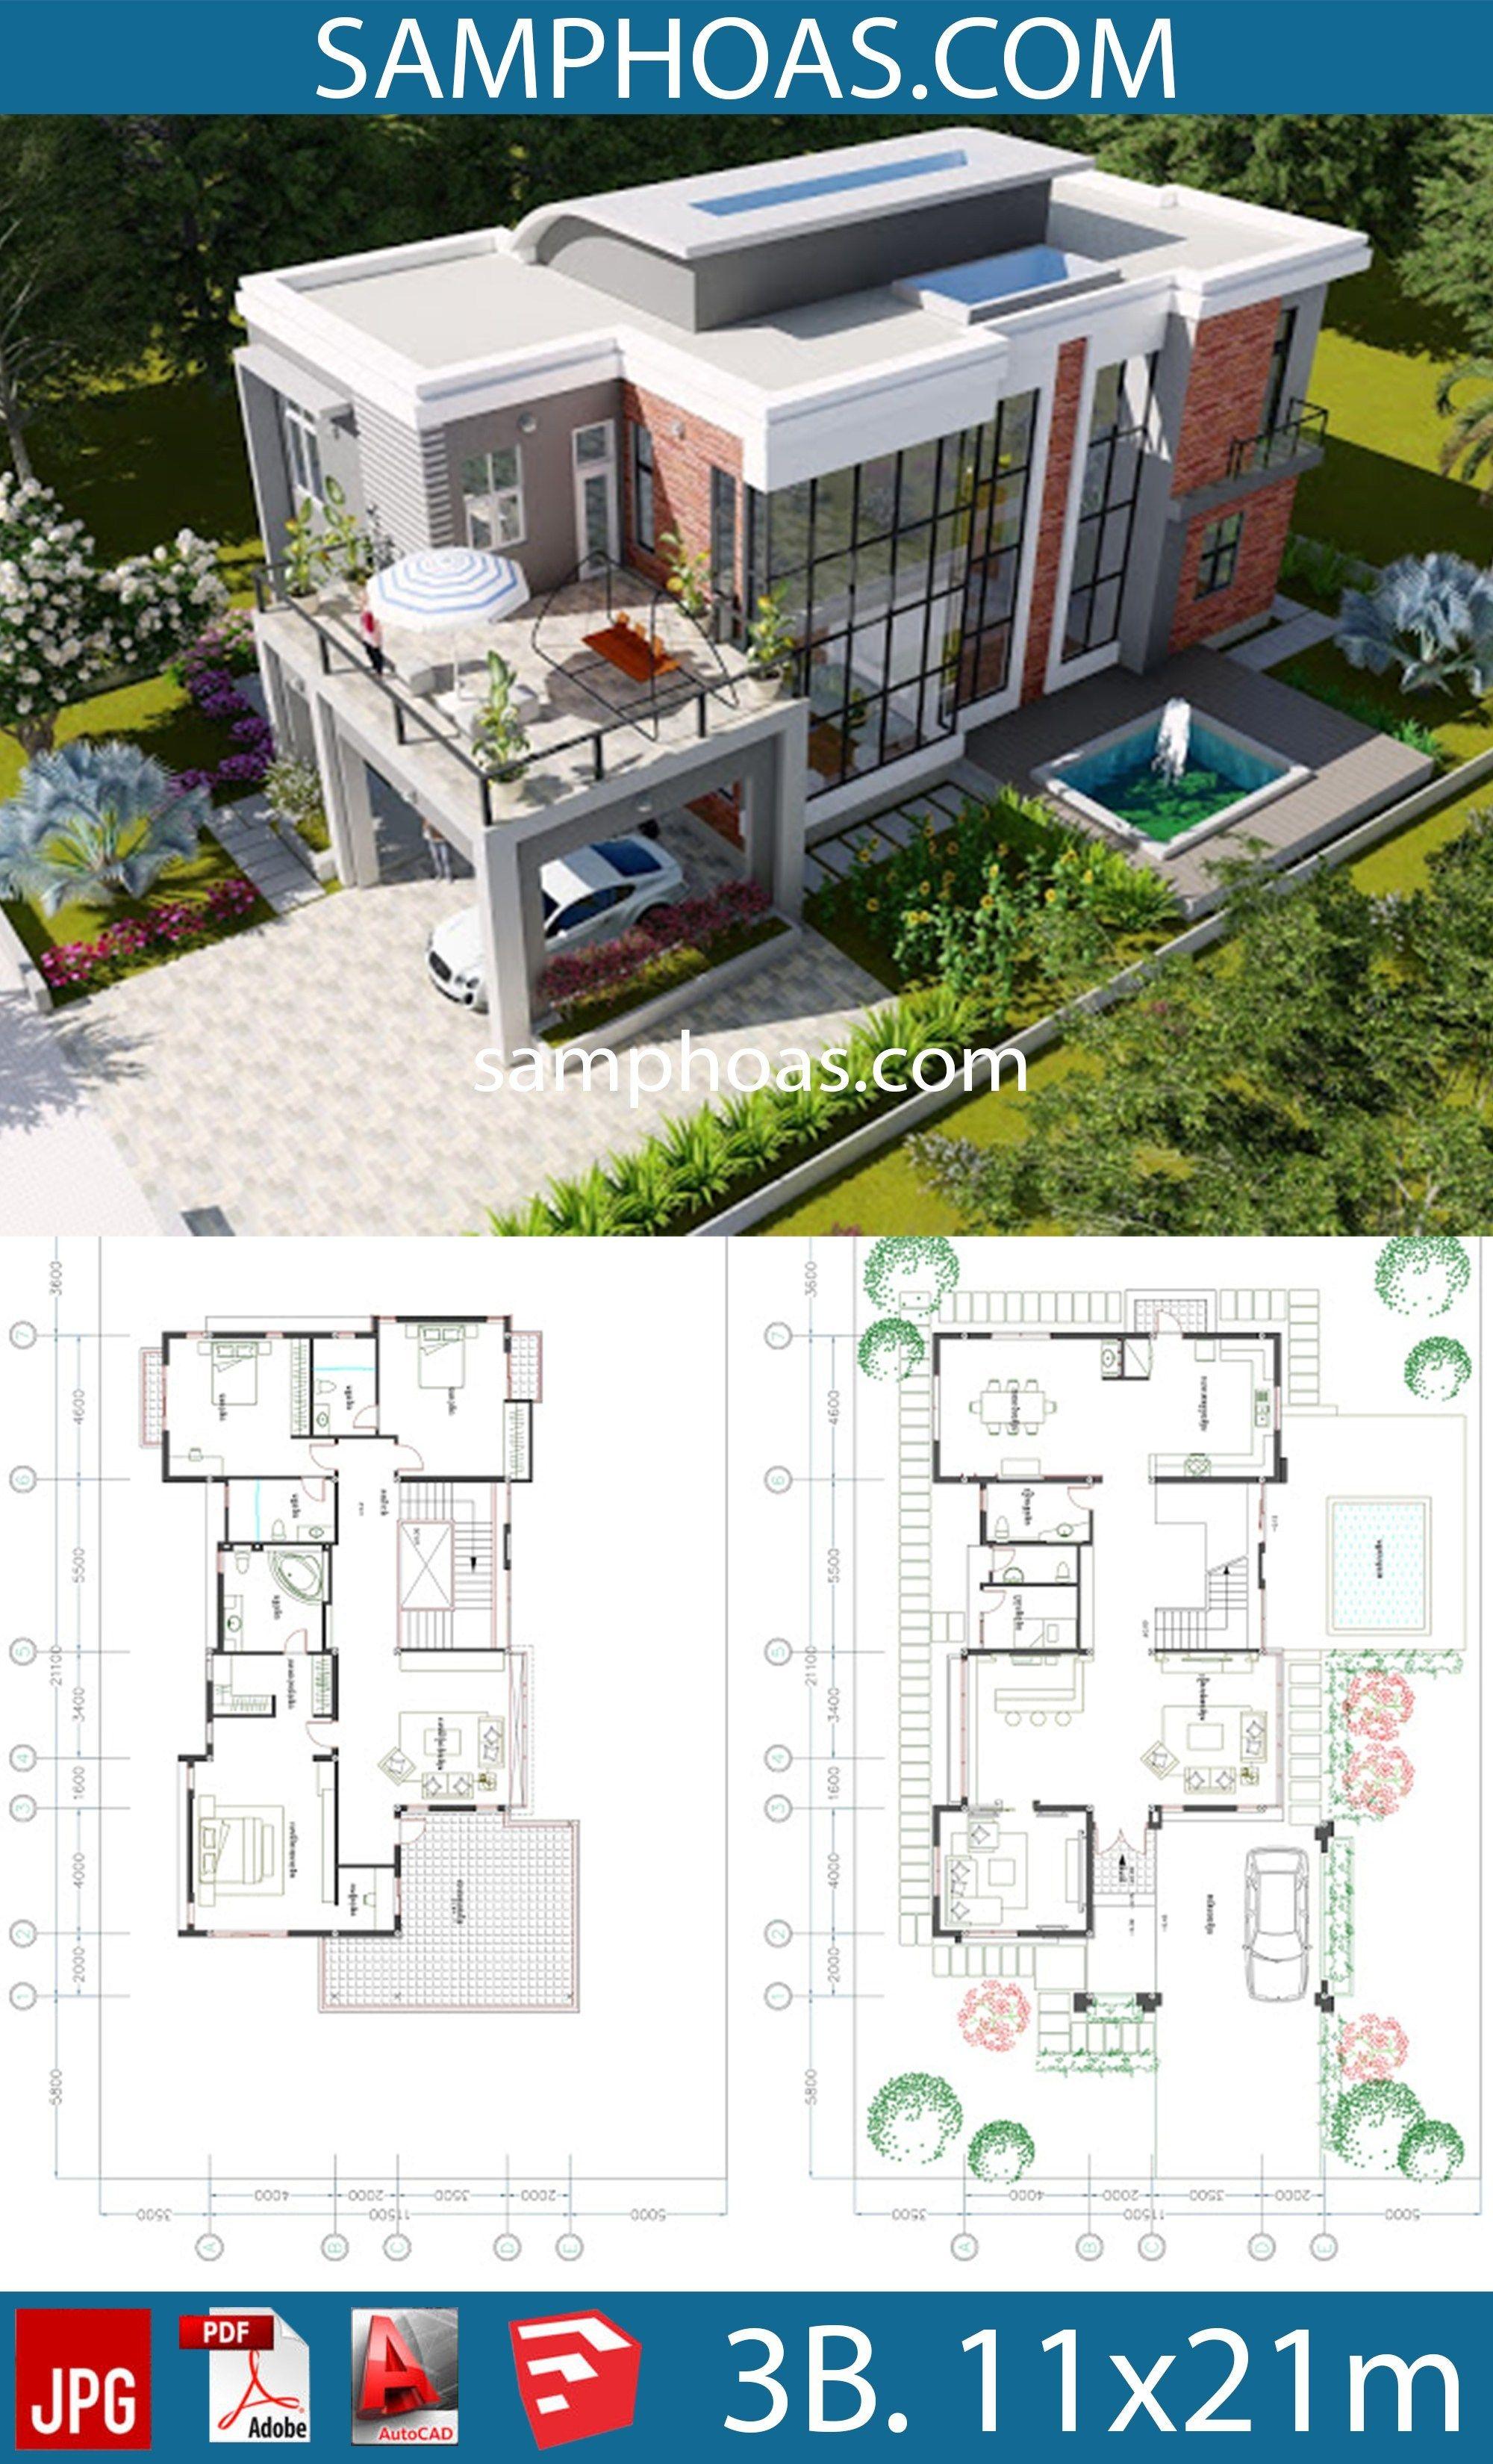 3 Bedroom Modern Villa Design Size 11 5x21 1m Samphoas Plan Architecture Model House Modern Villa Design Sims House Plans